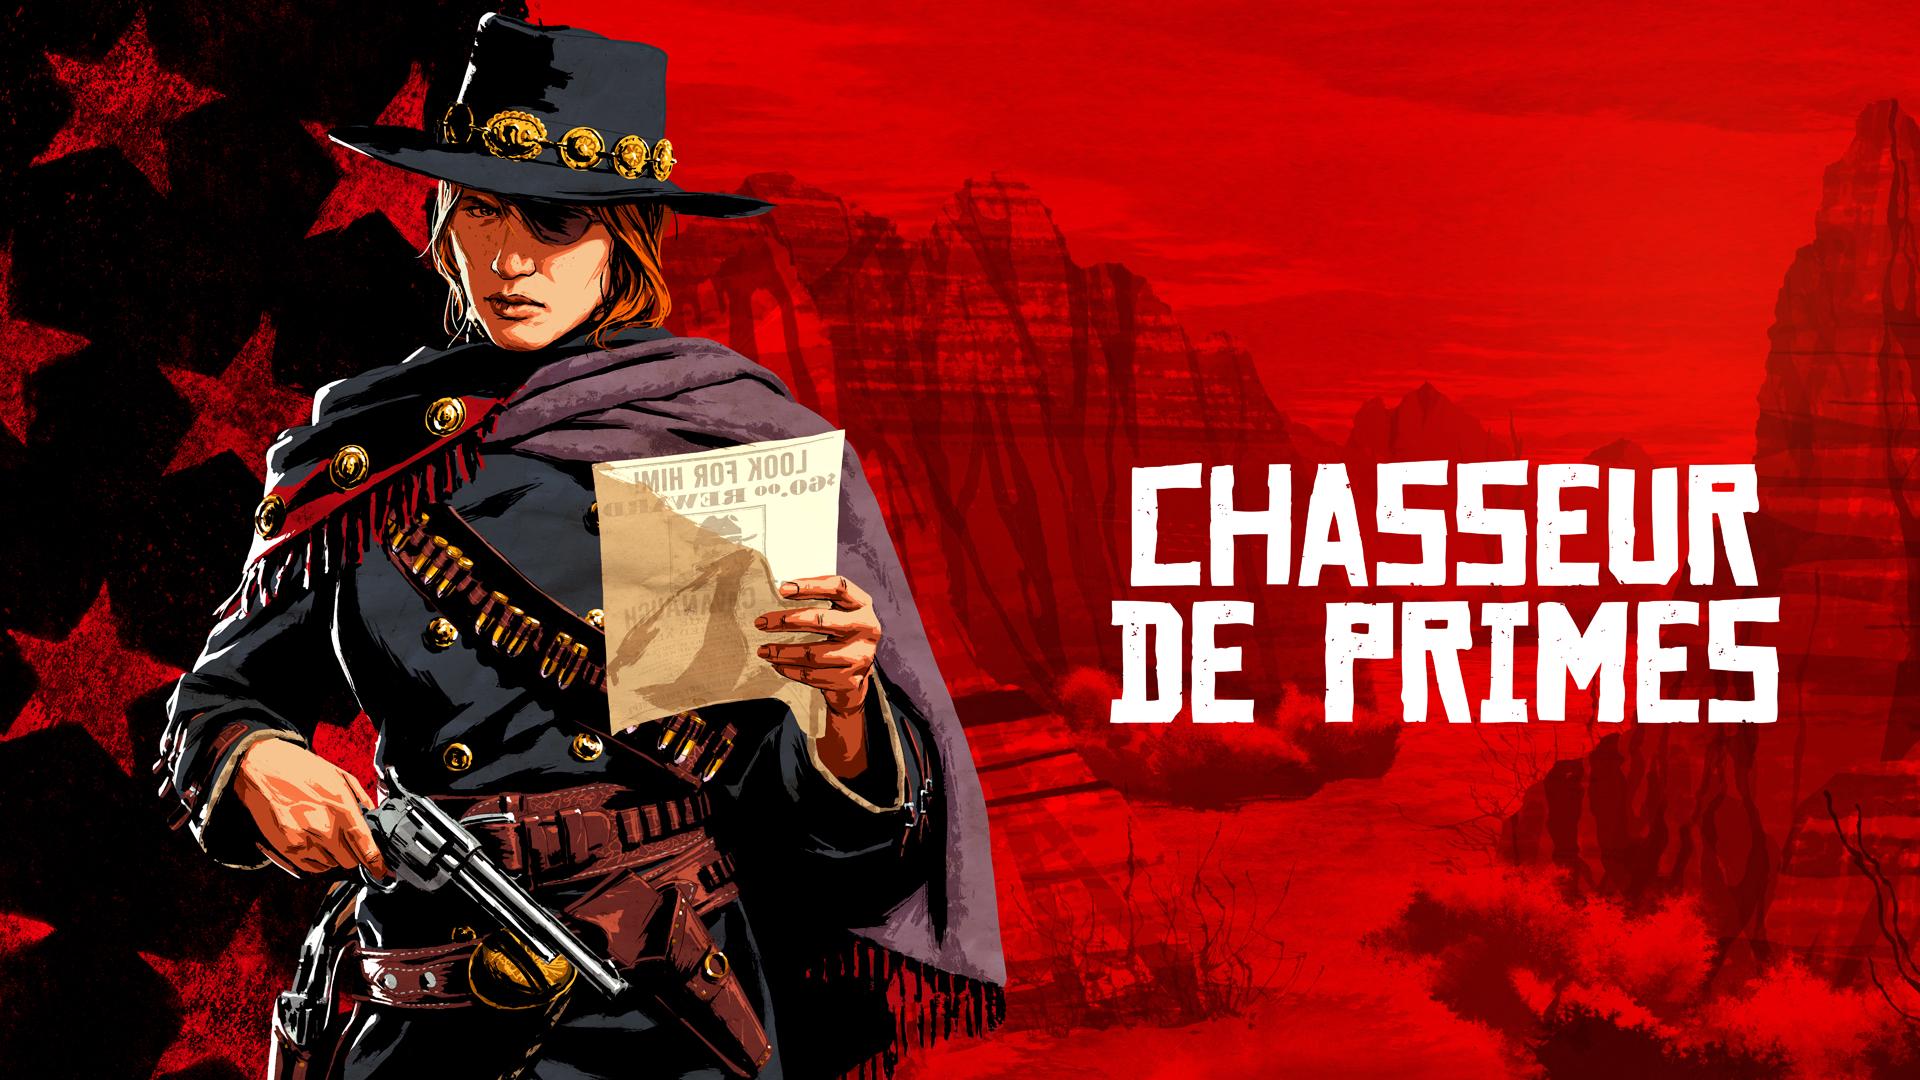 red-dead-online-artwork-21-fr-hd.jpg